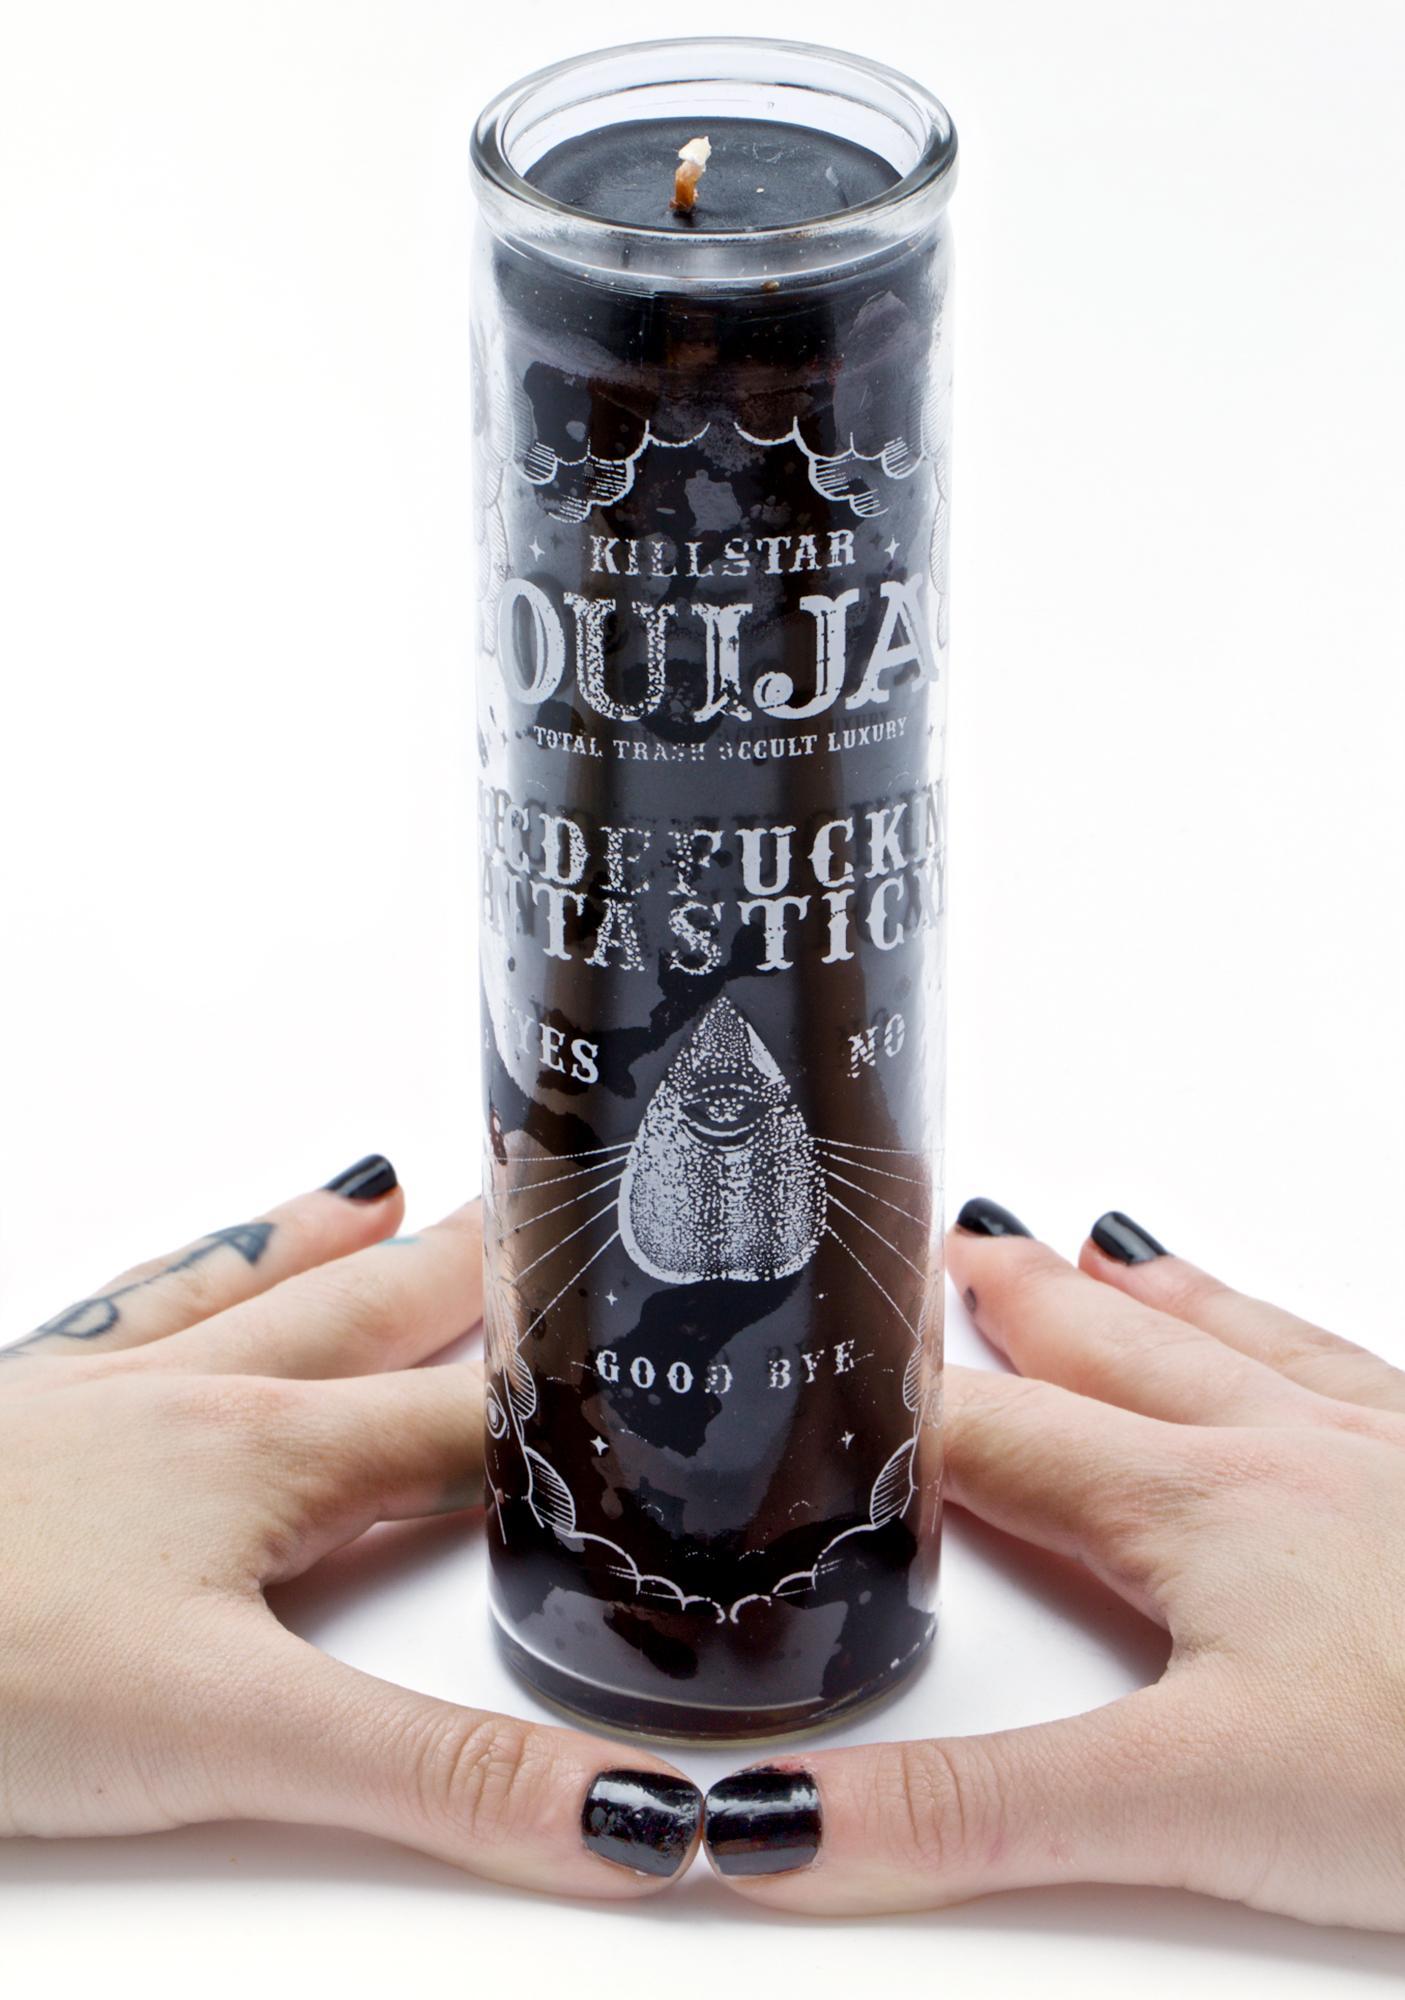 Killstar Ouija Candle